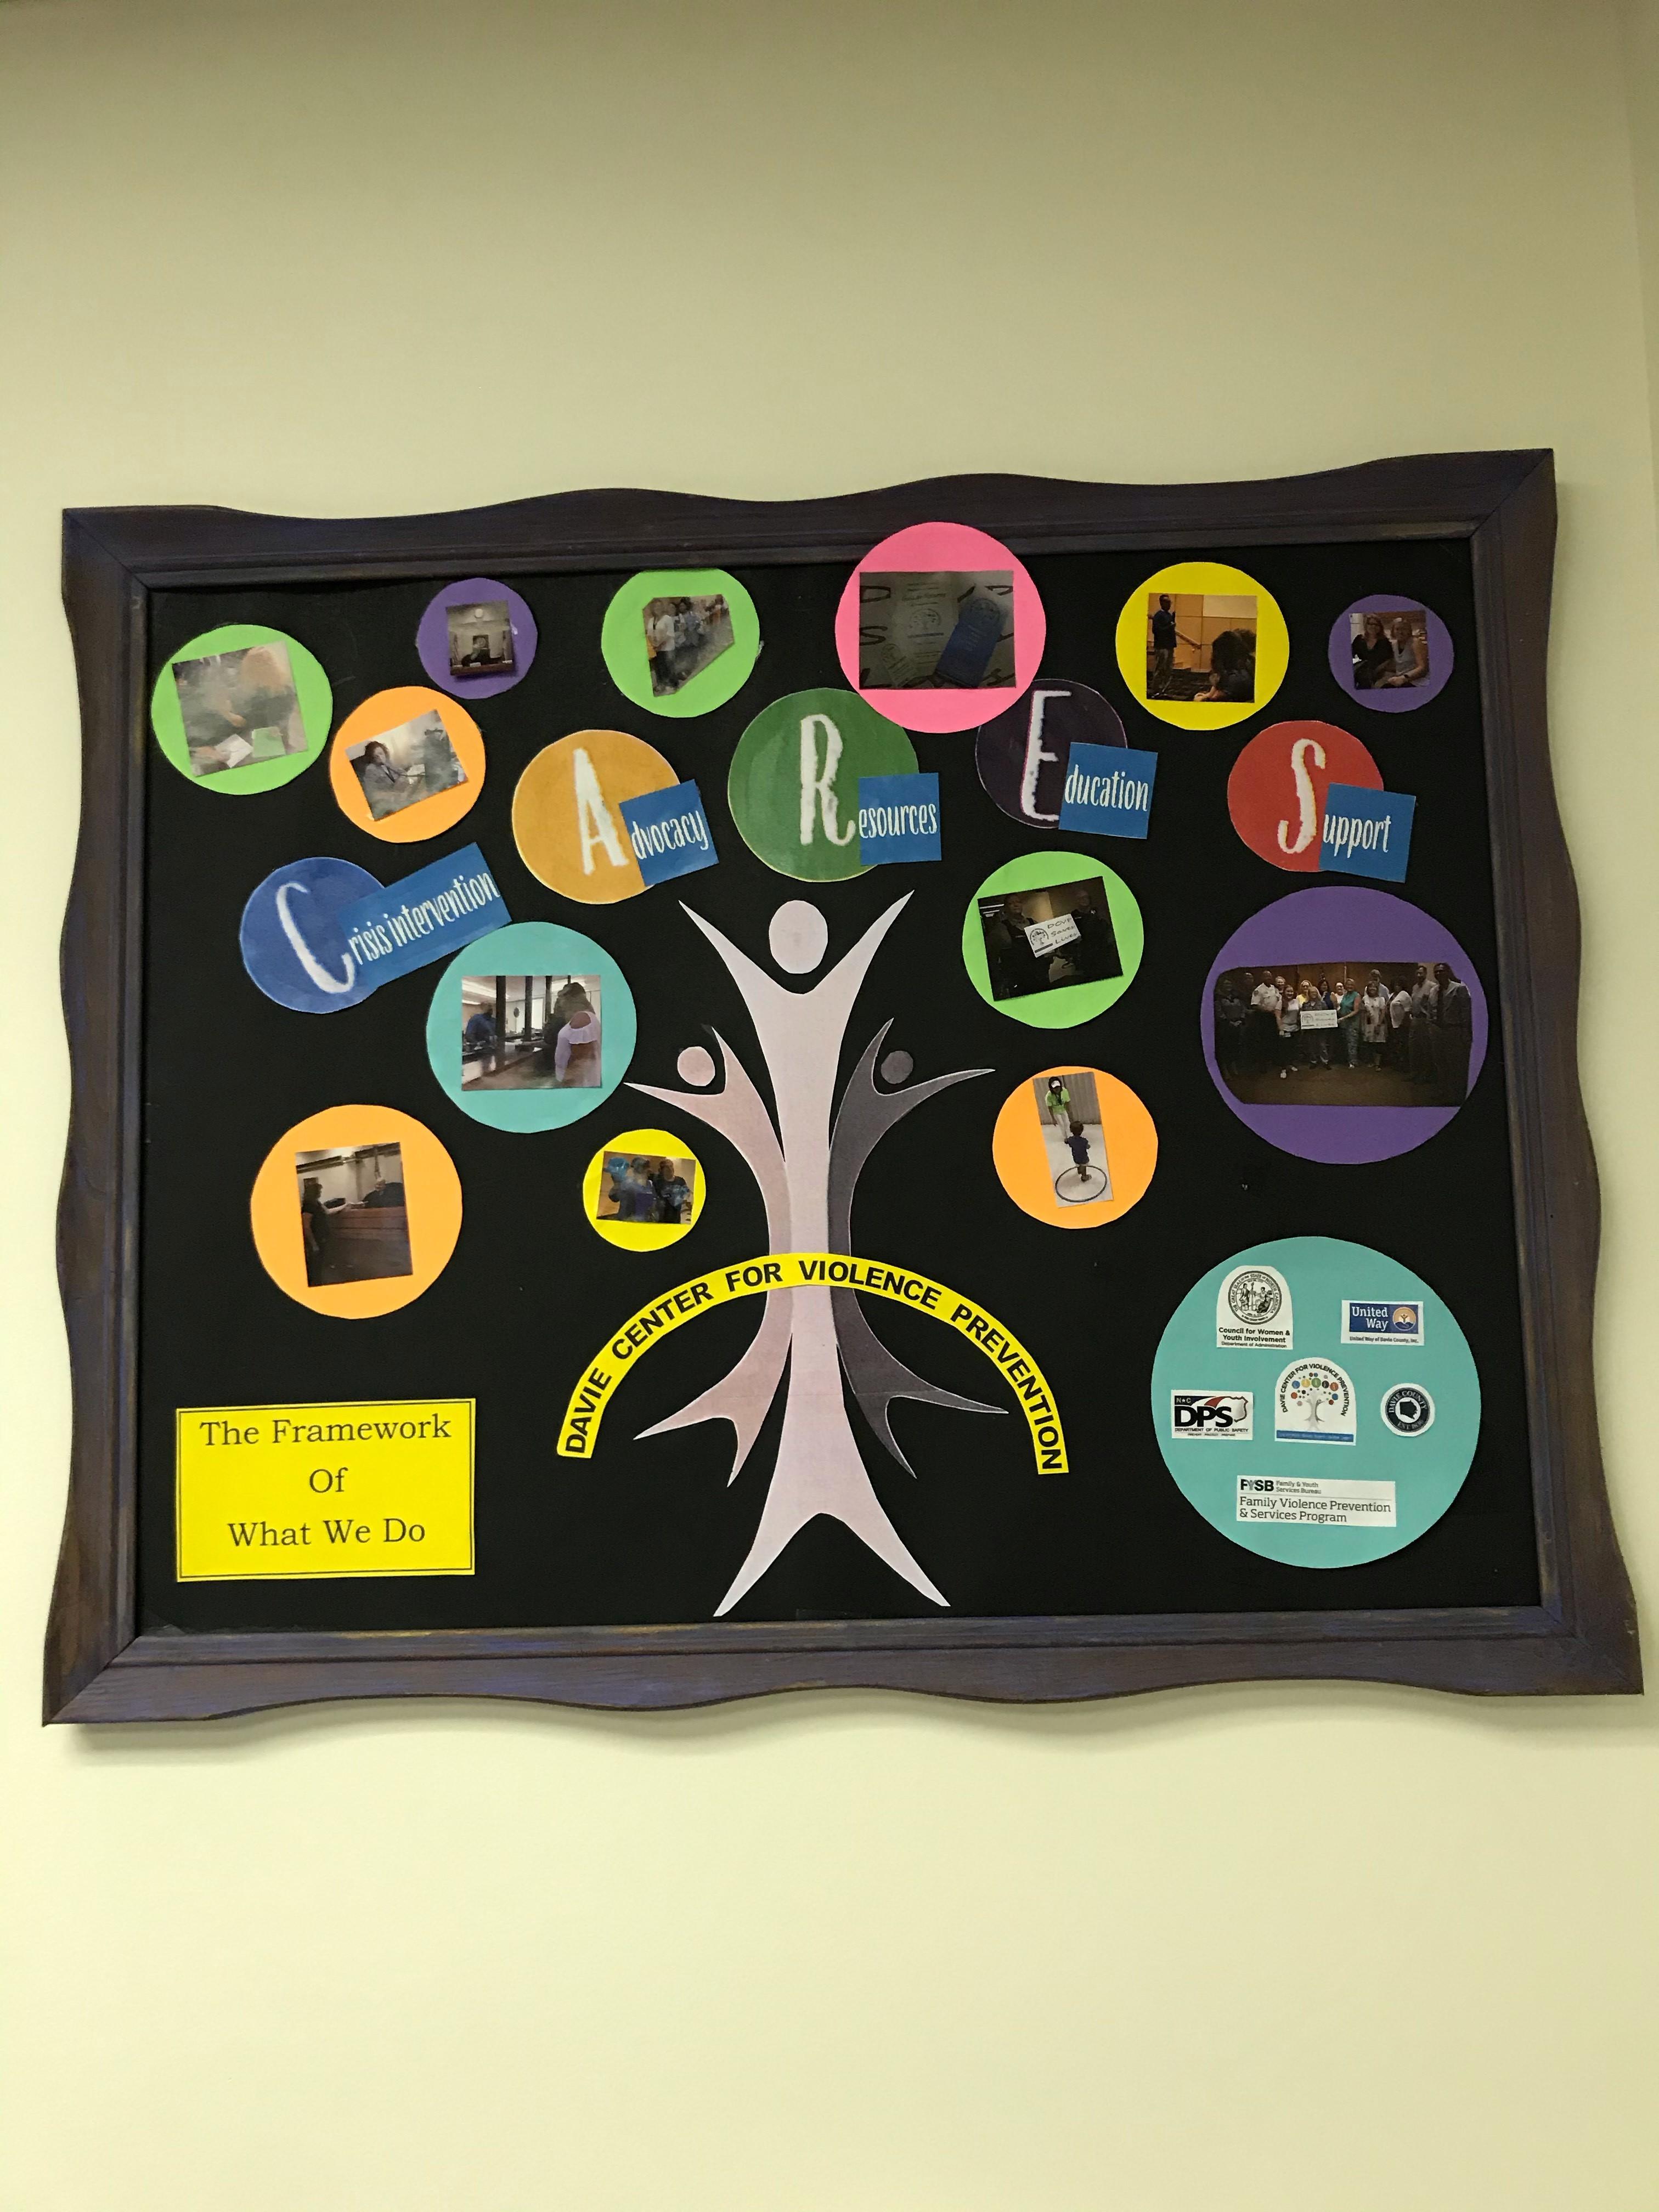 Davie Center for Violence Prevention Artwork